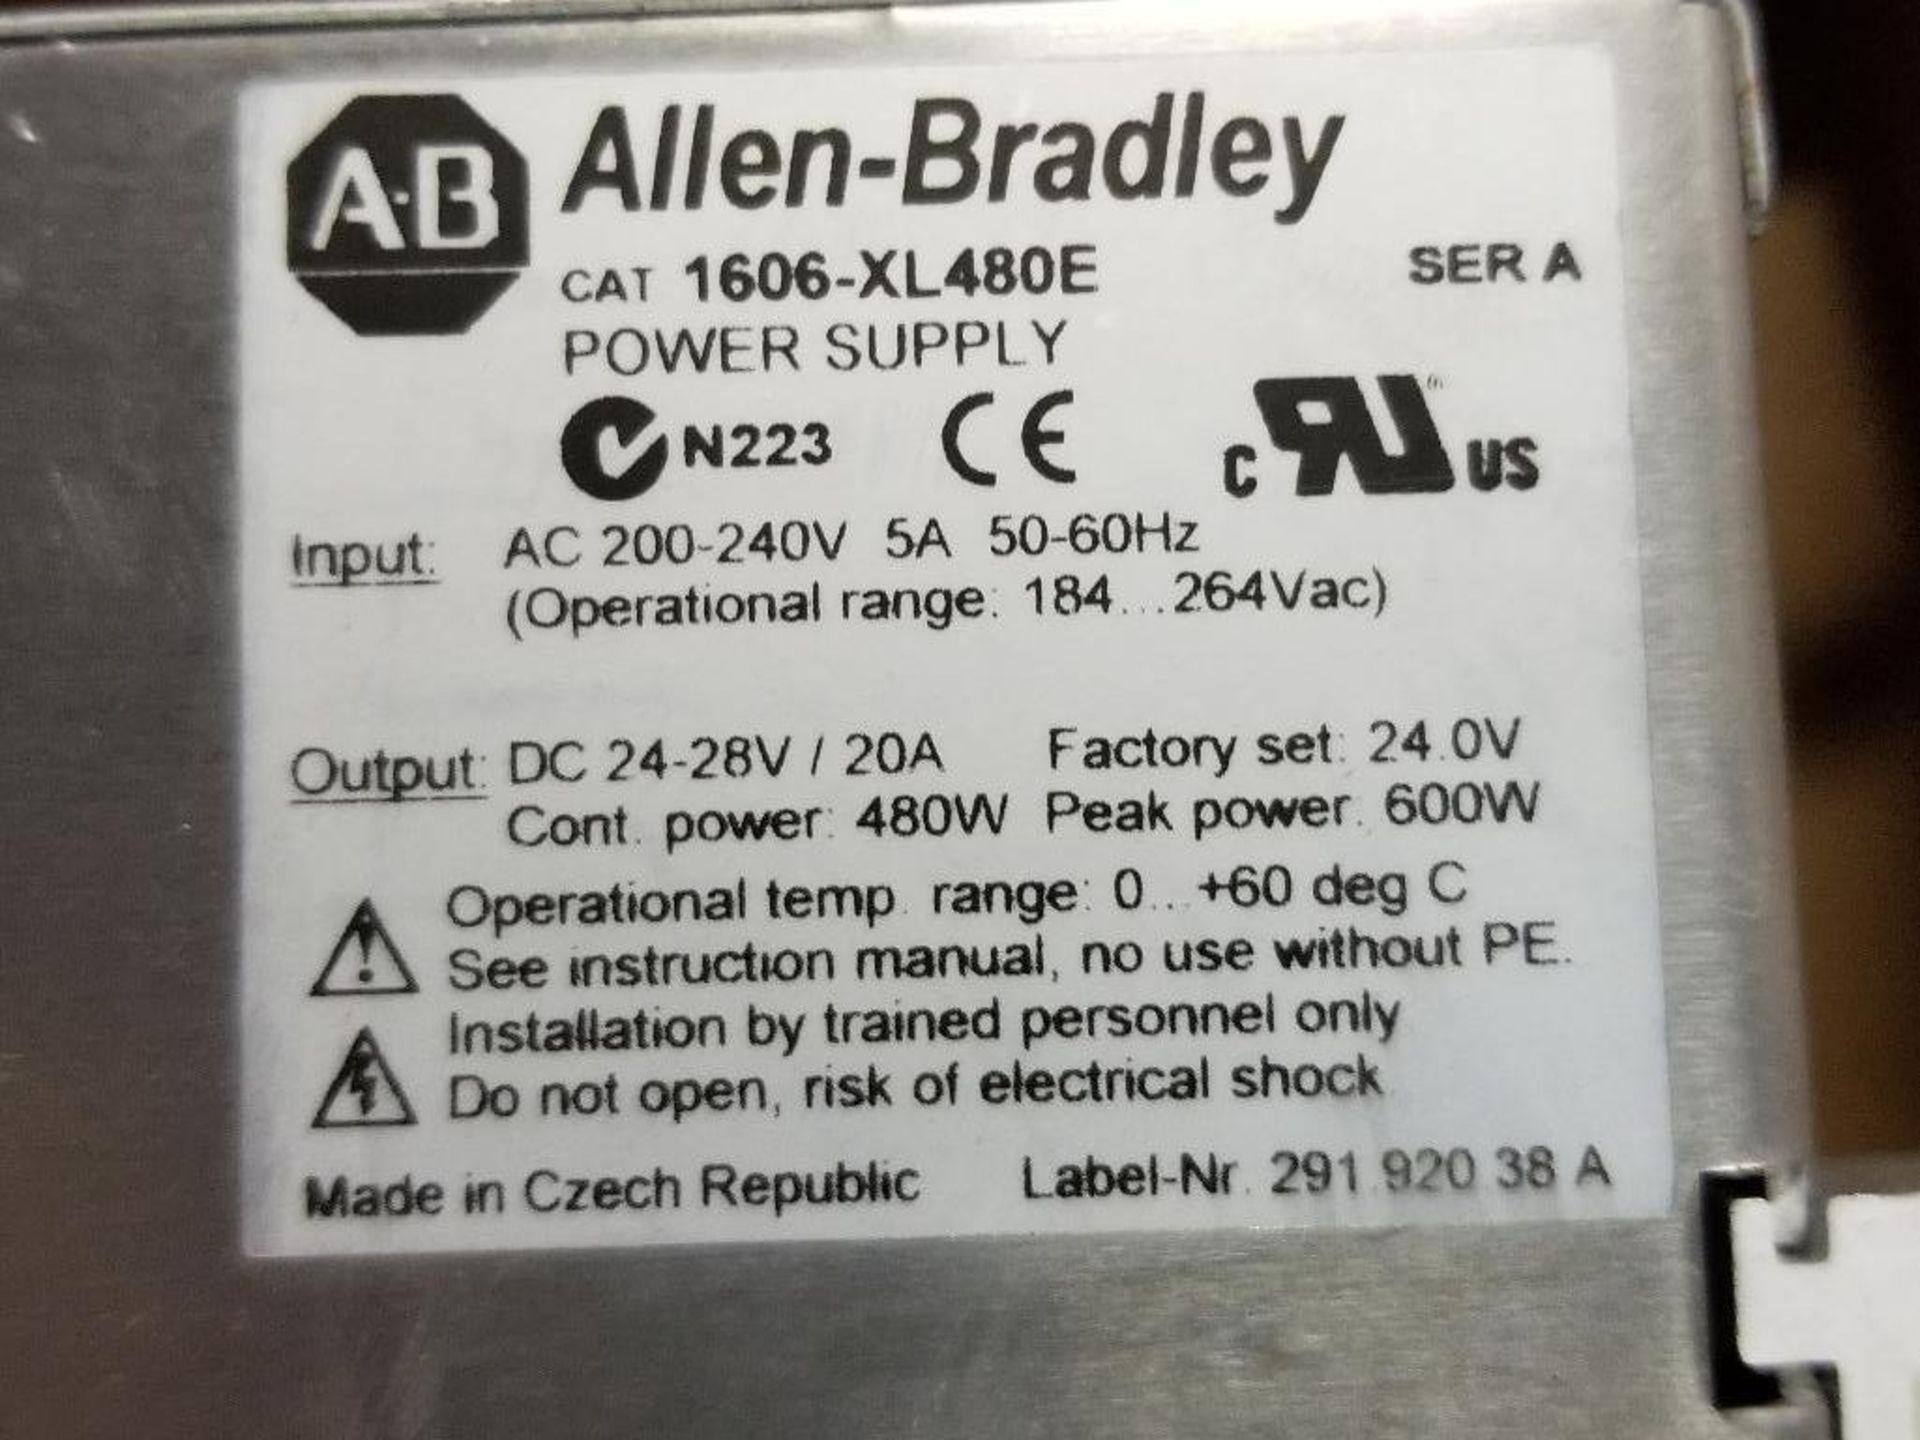 Allen Bradley 1606-XL power supply. 1606-XL480E. - Image 4 of 4